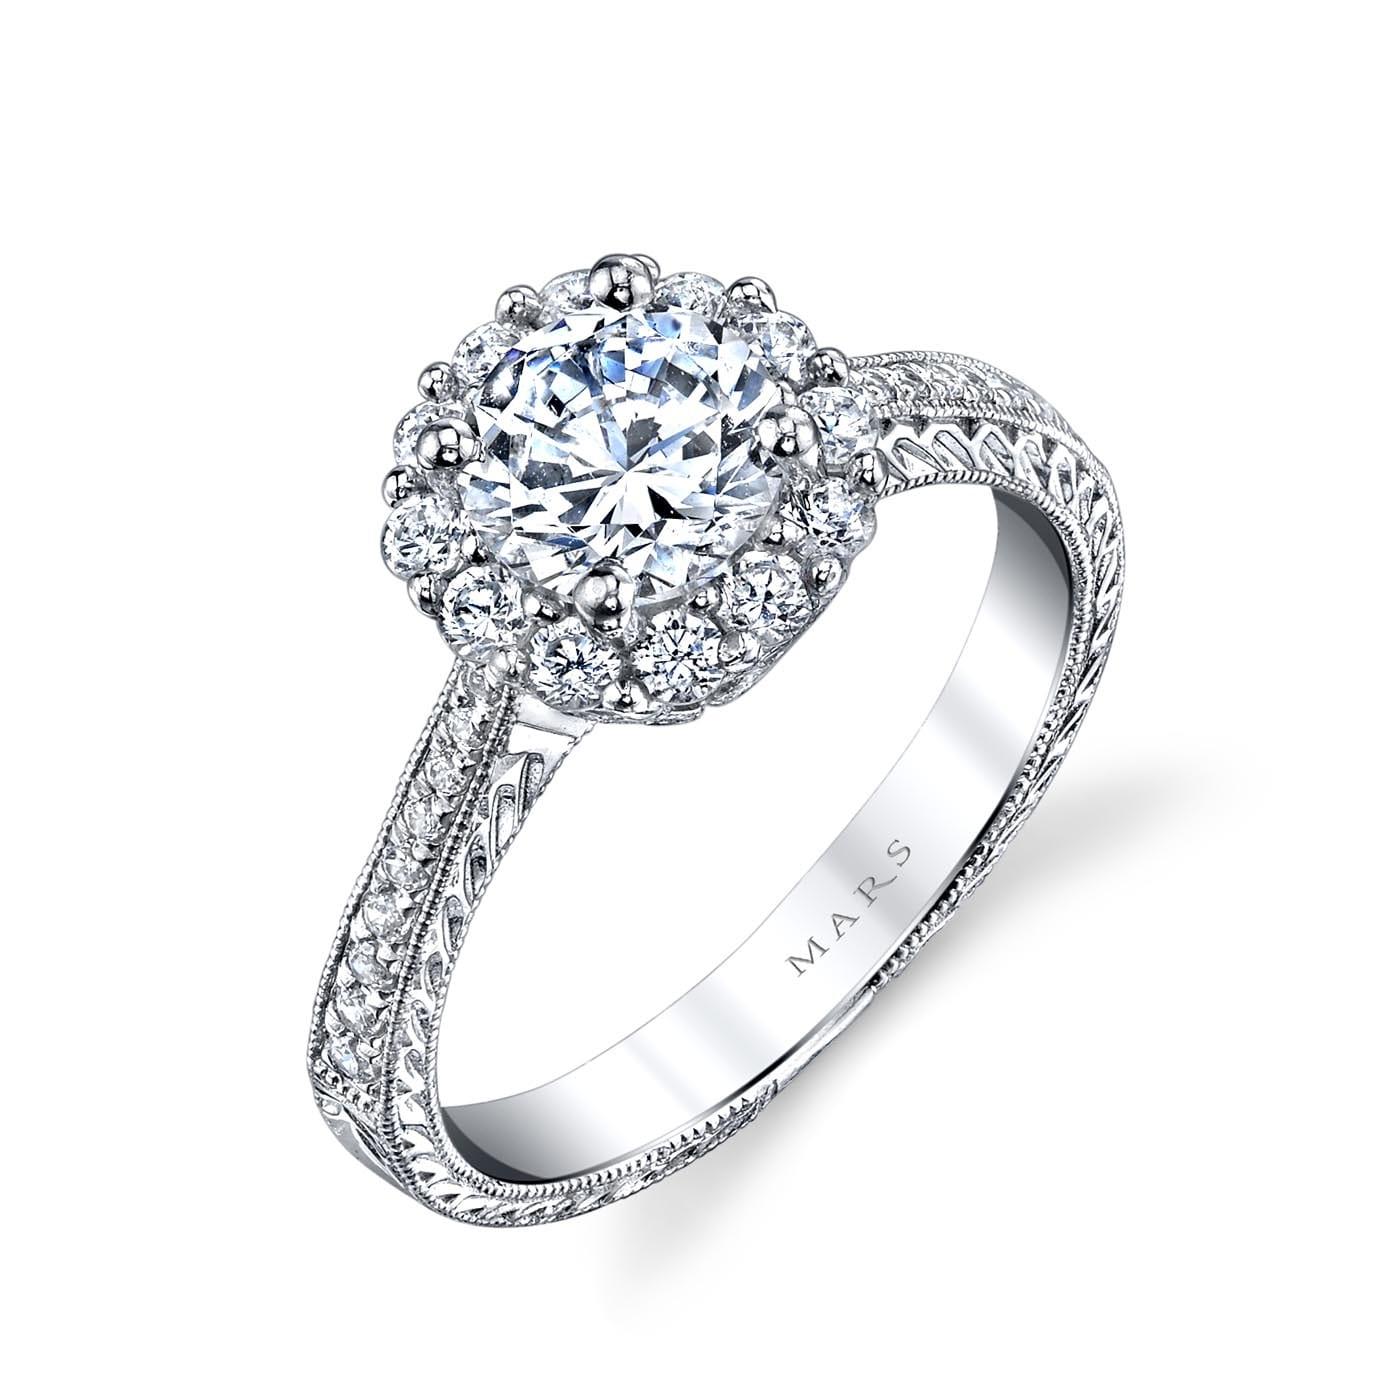 Halo Engagement RingStyle #: MARS 25586